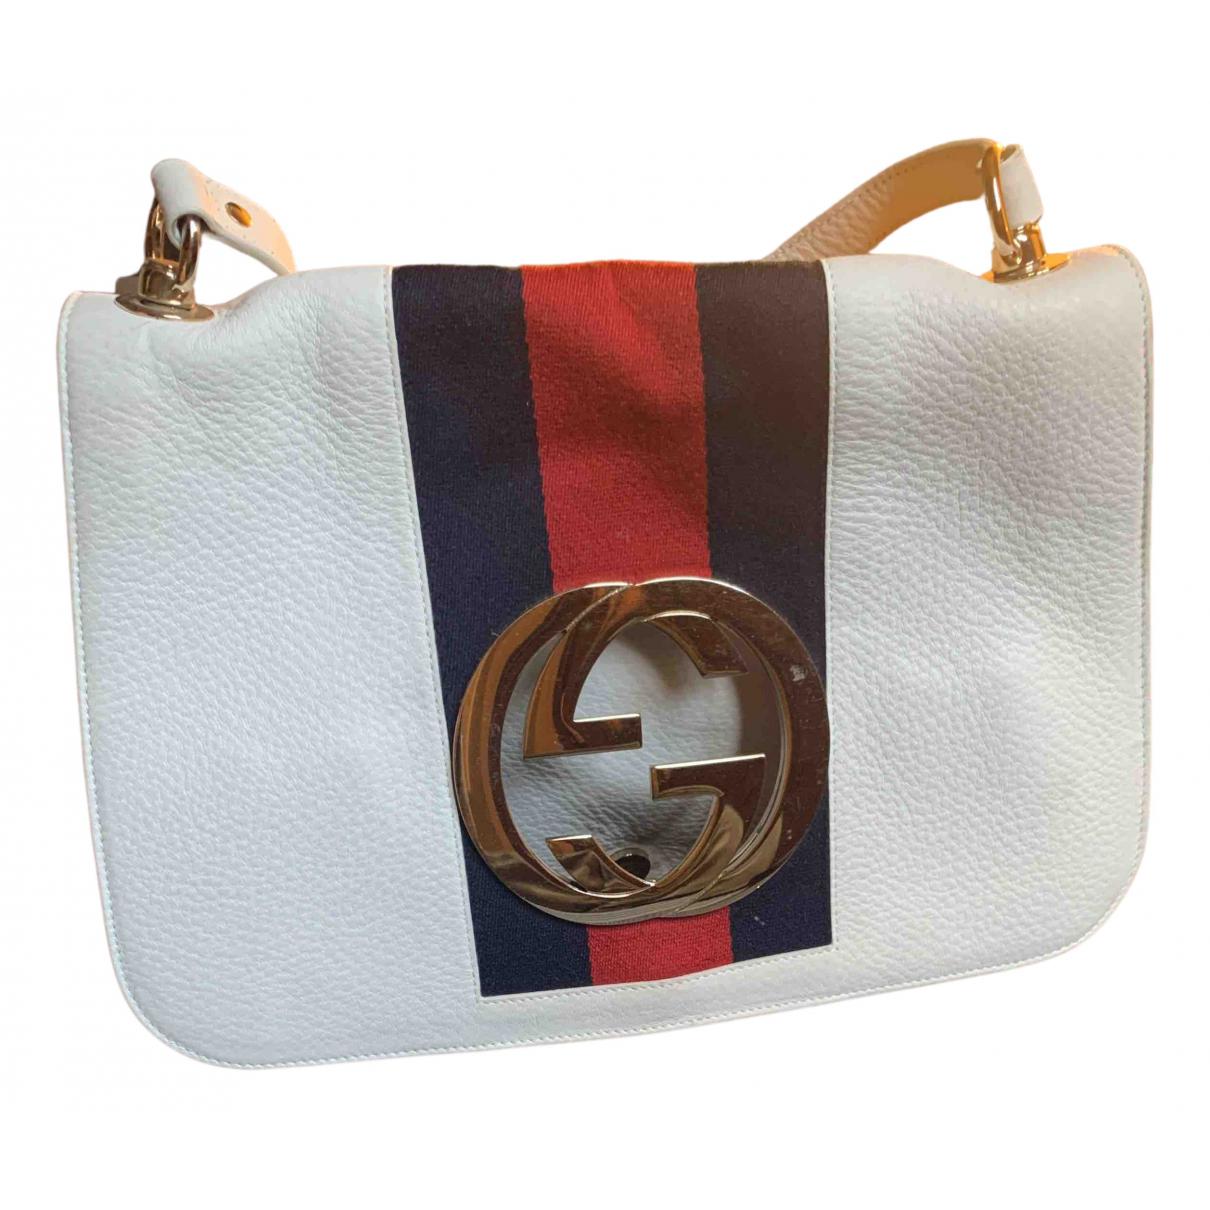 Gucci Interlocking White Leather handbag for Women N